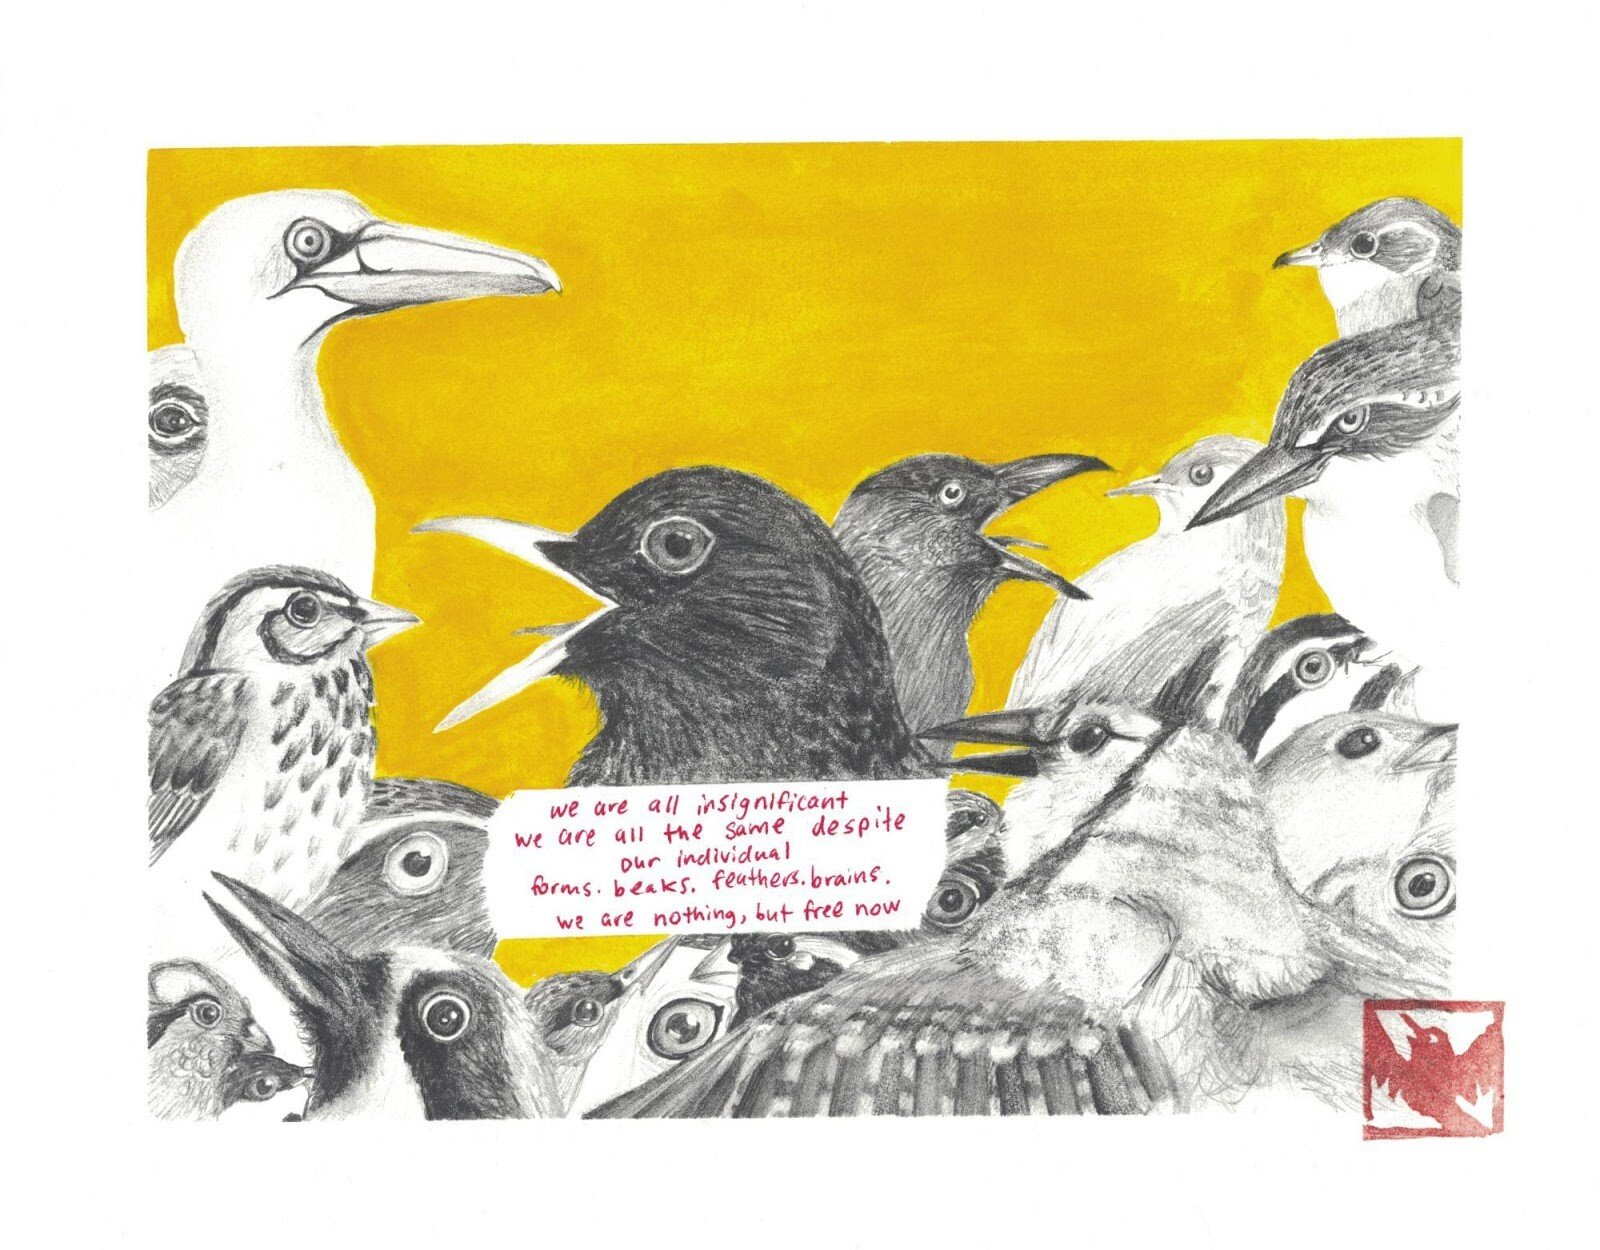 all free now birds.jpg